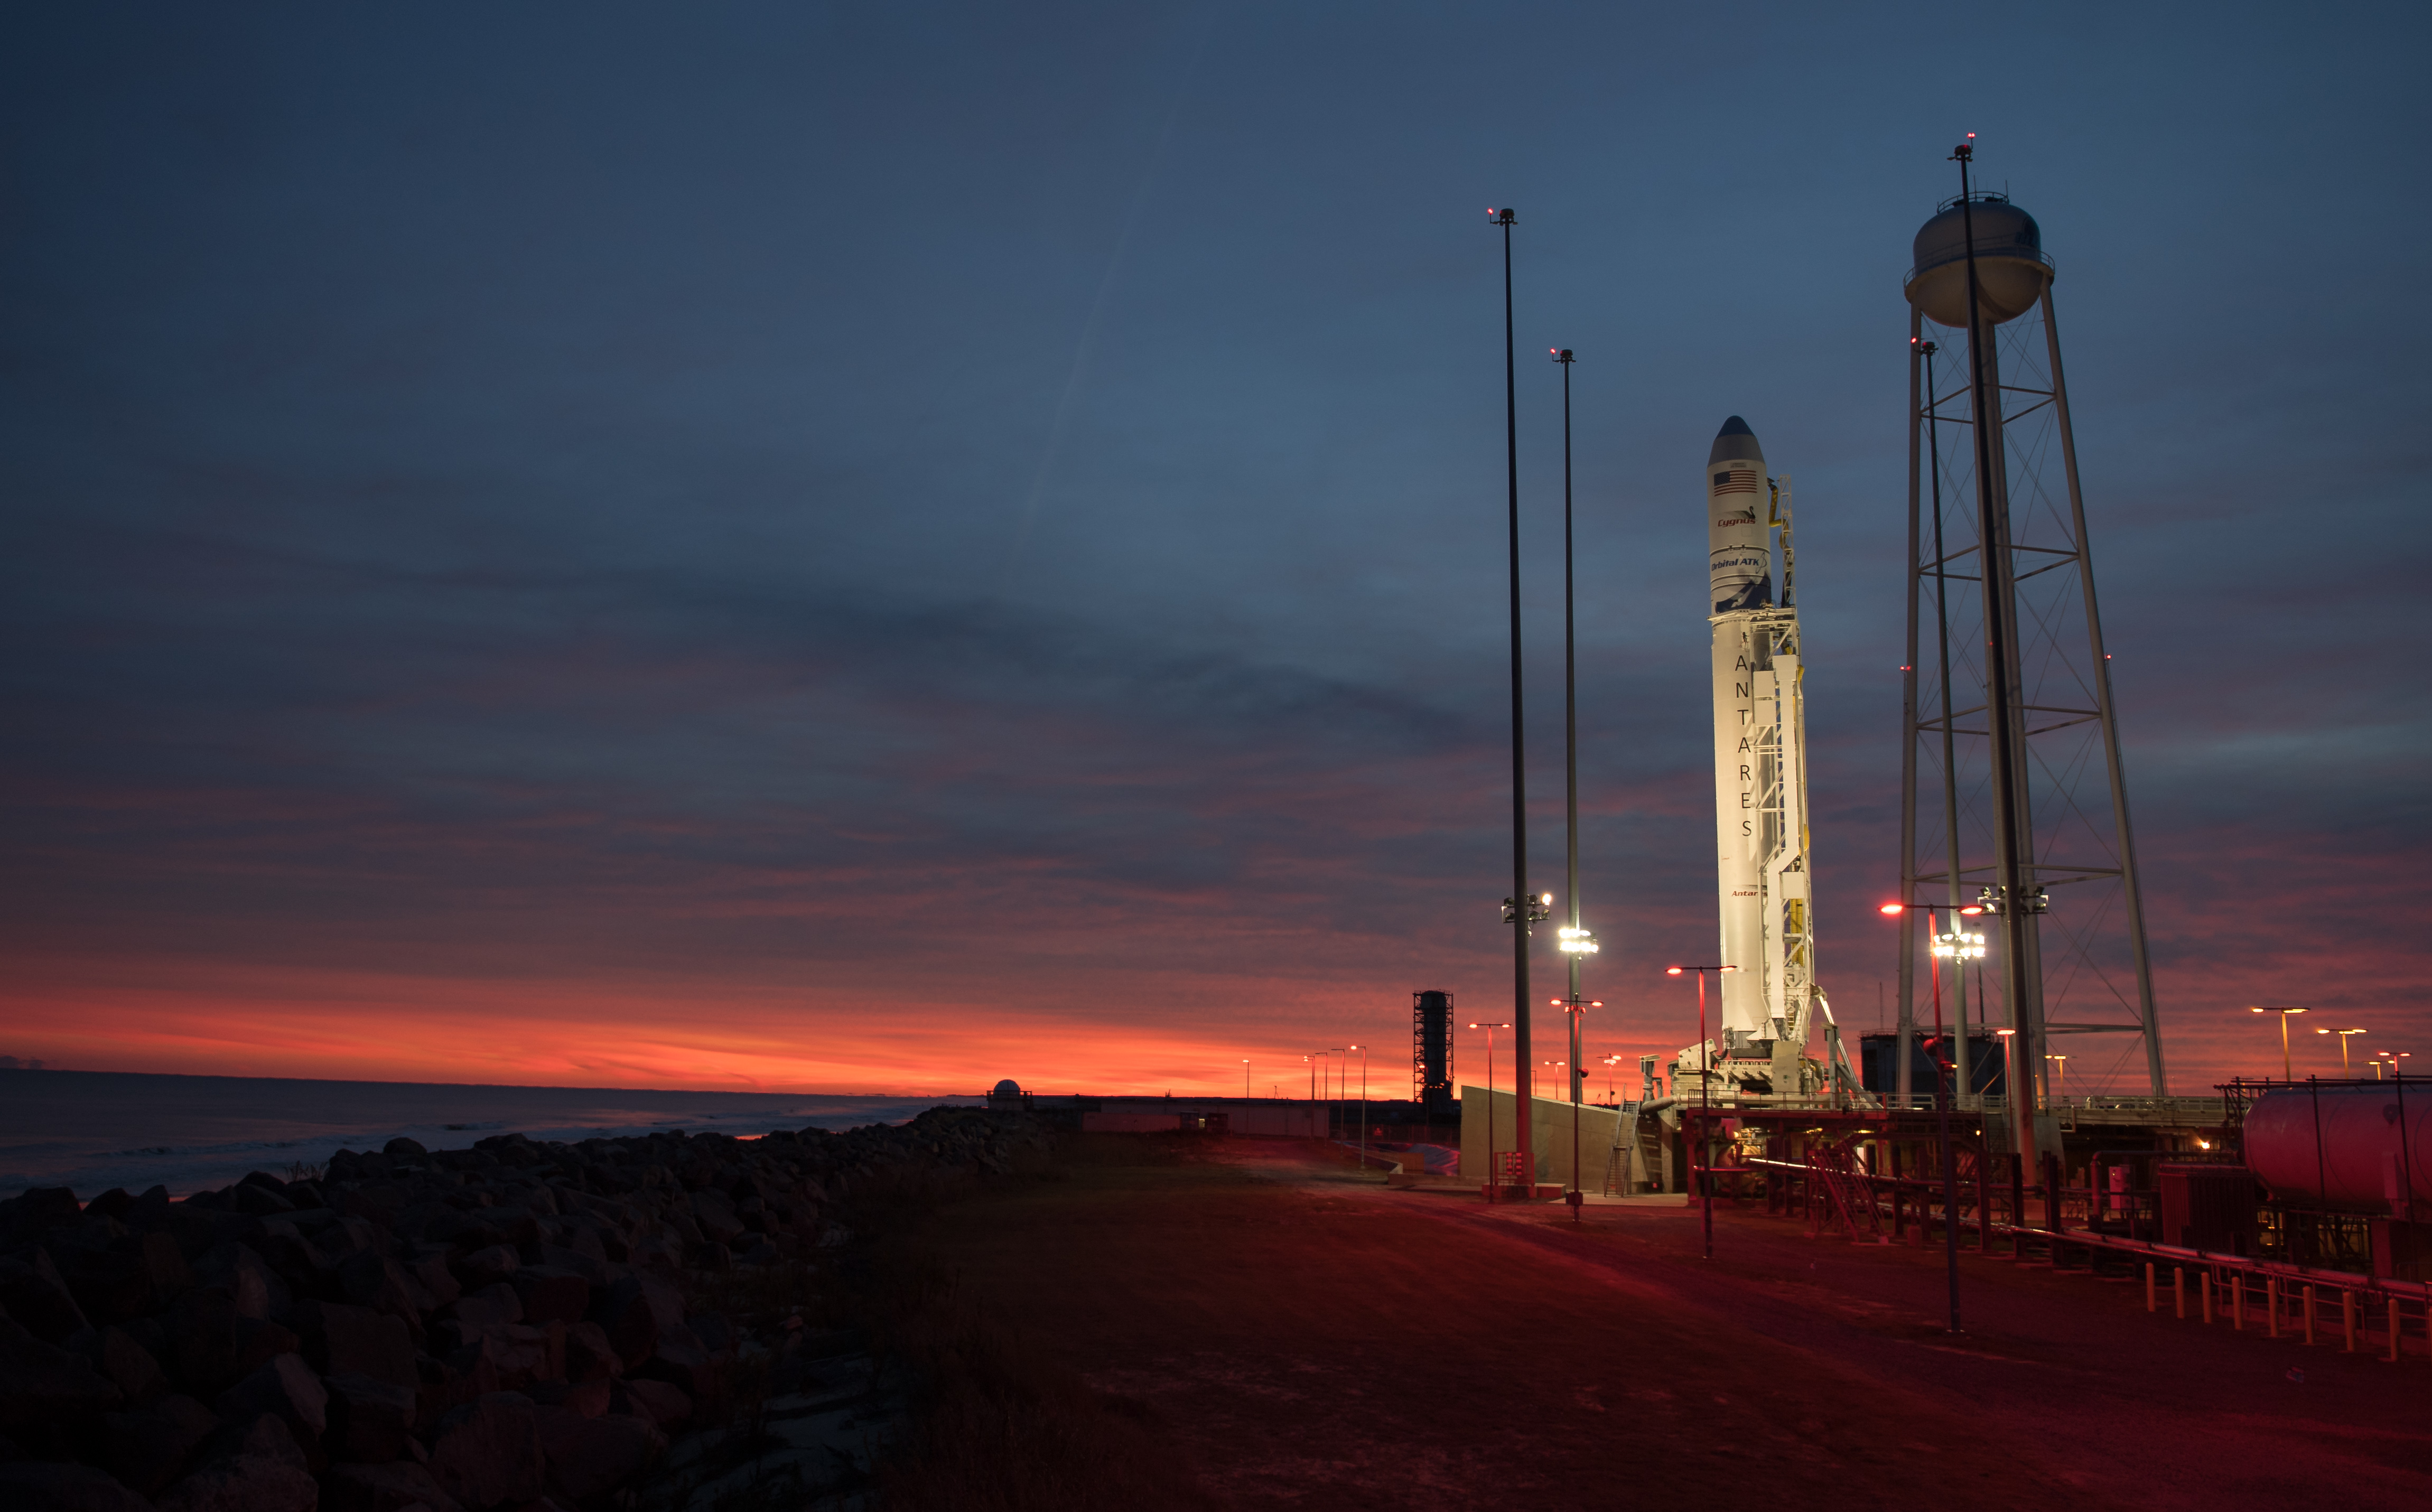 NASA commercial cargo provider Orbital ATK NASA